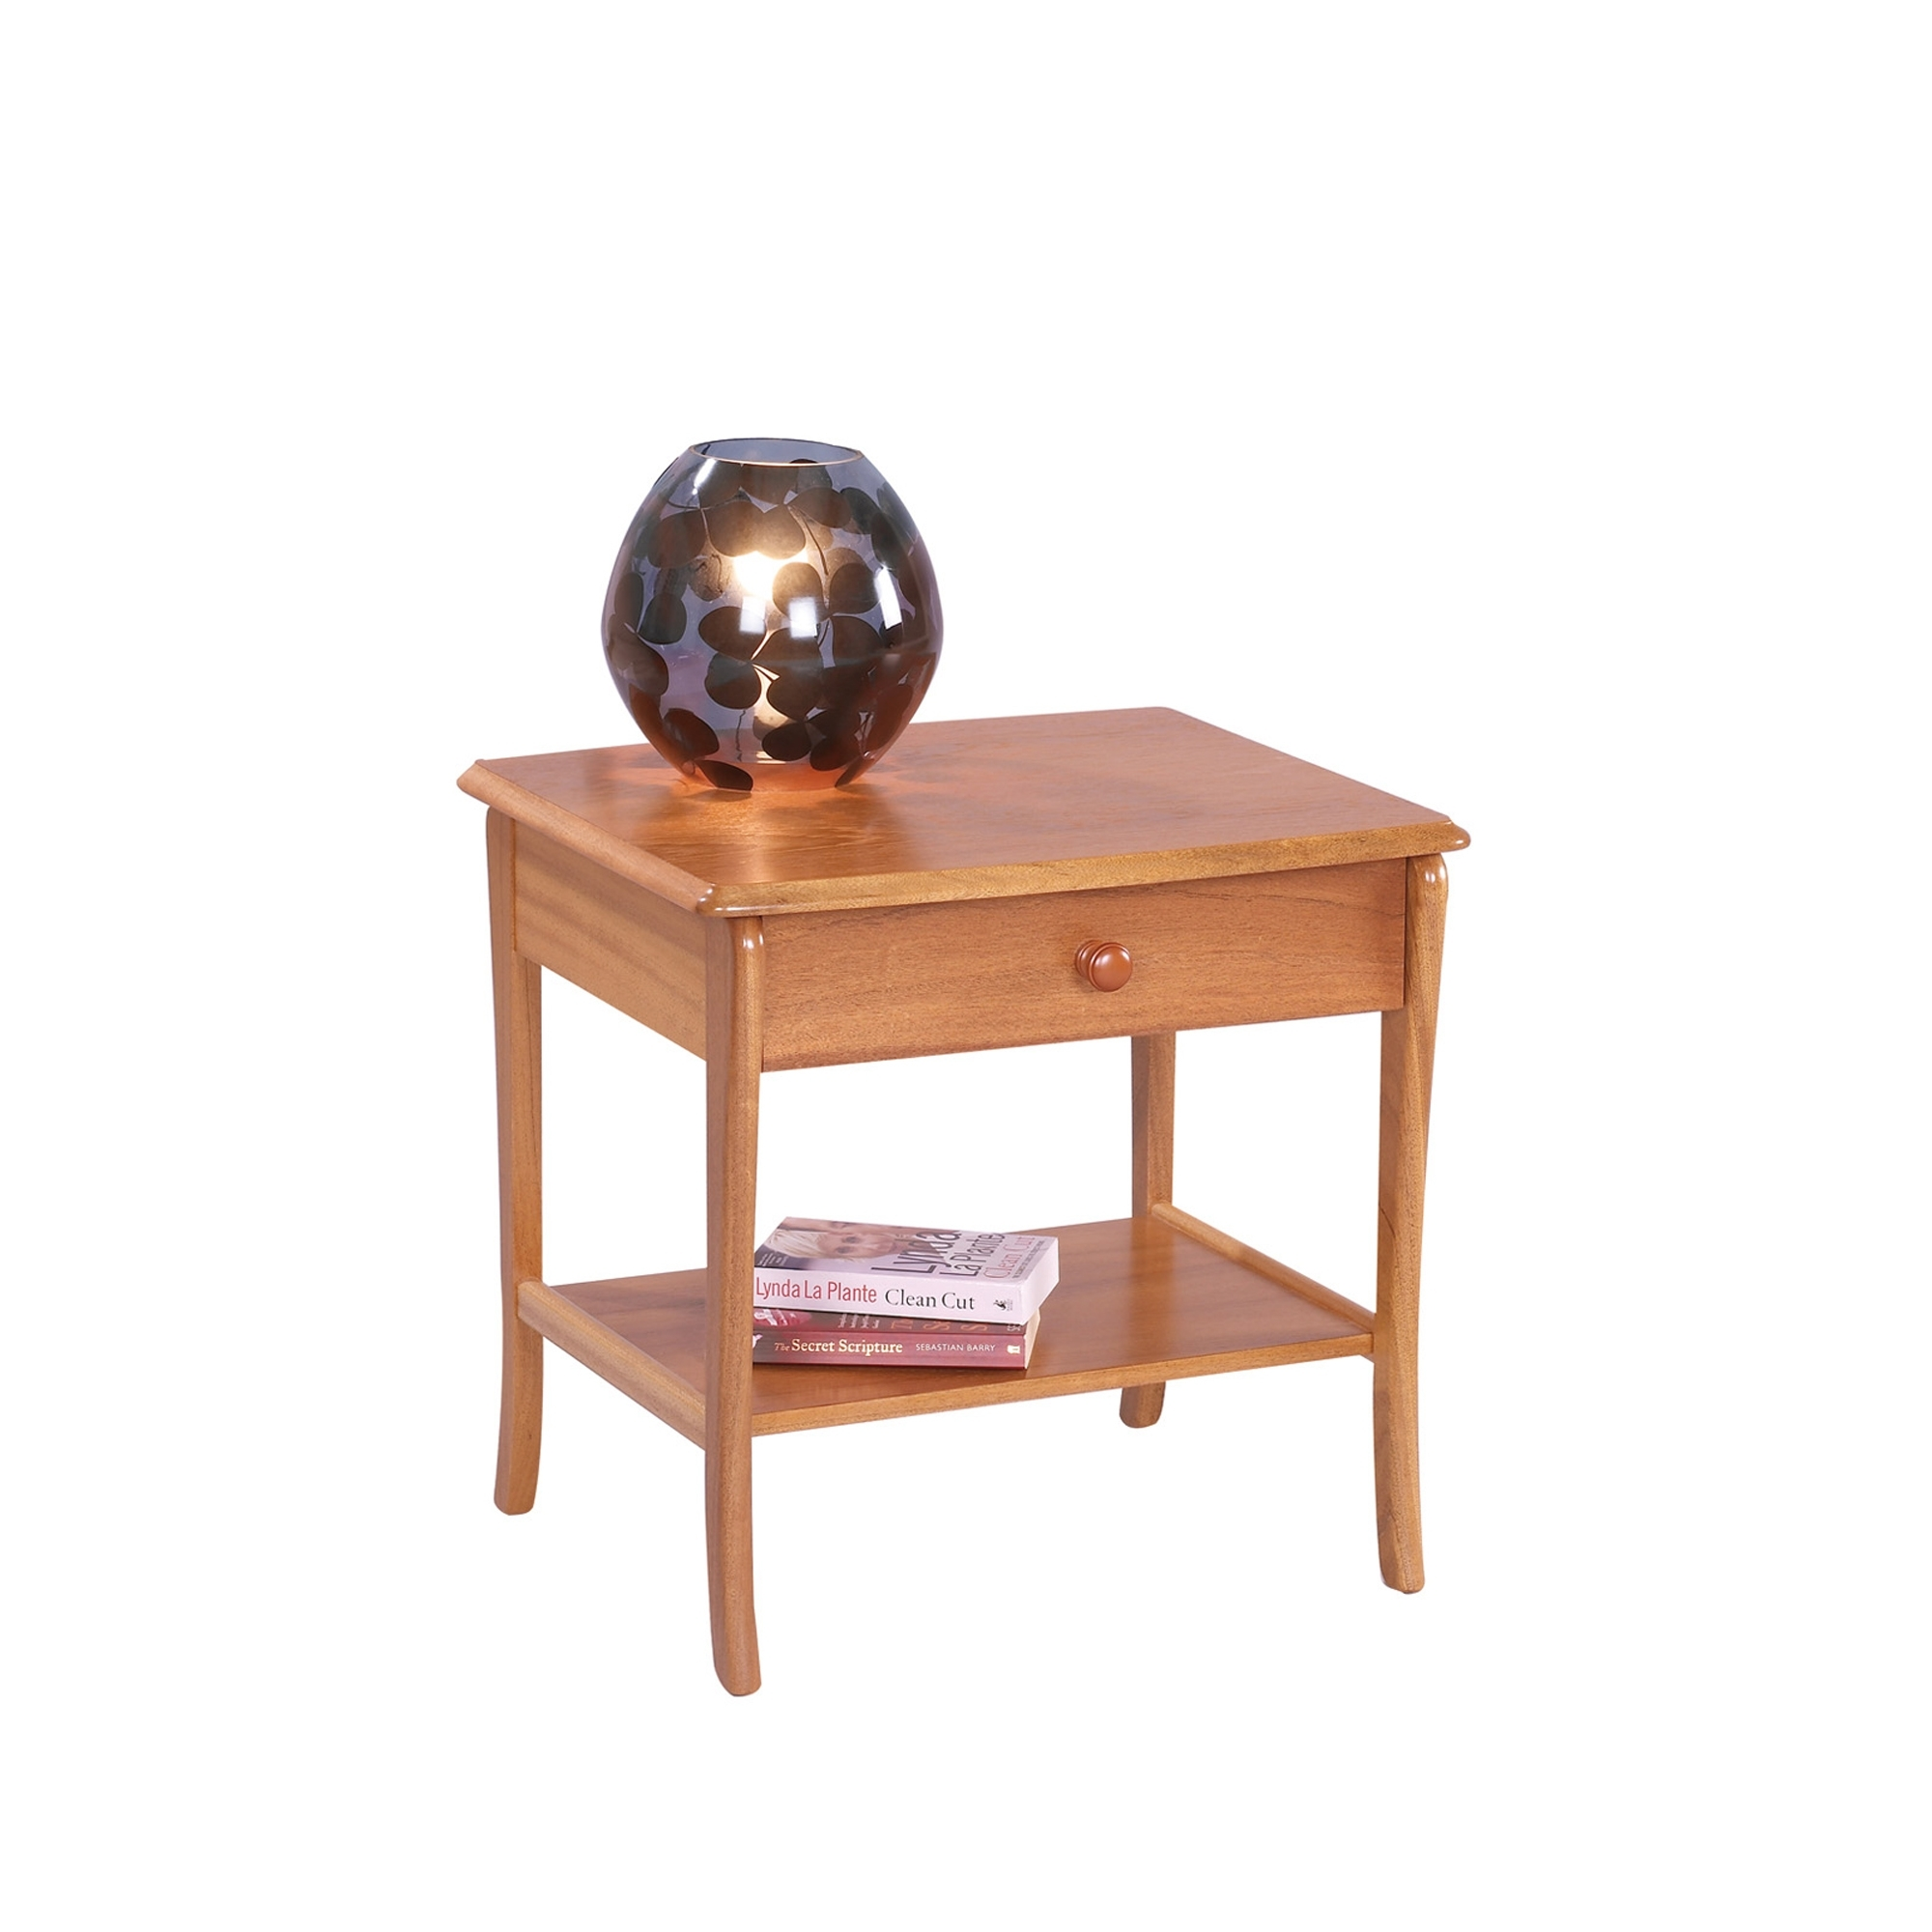 Sutcliffe trafalgar teak lamp table sutcliffe cookes furniture sutcliffe trafalgar teak lamp table aloadofball Images